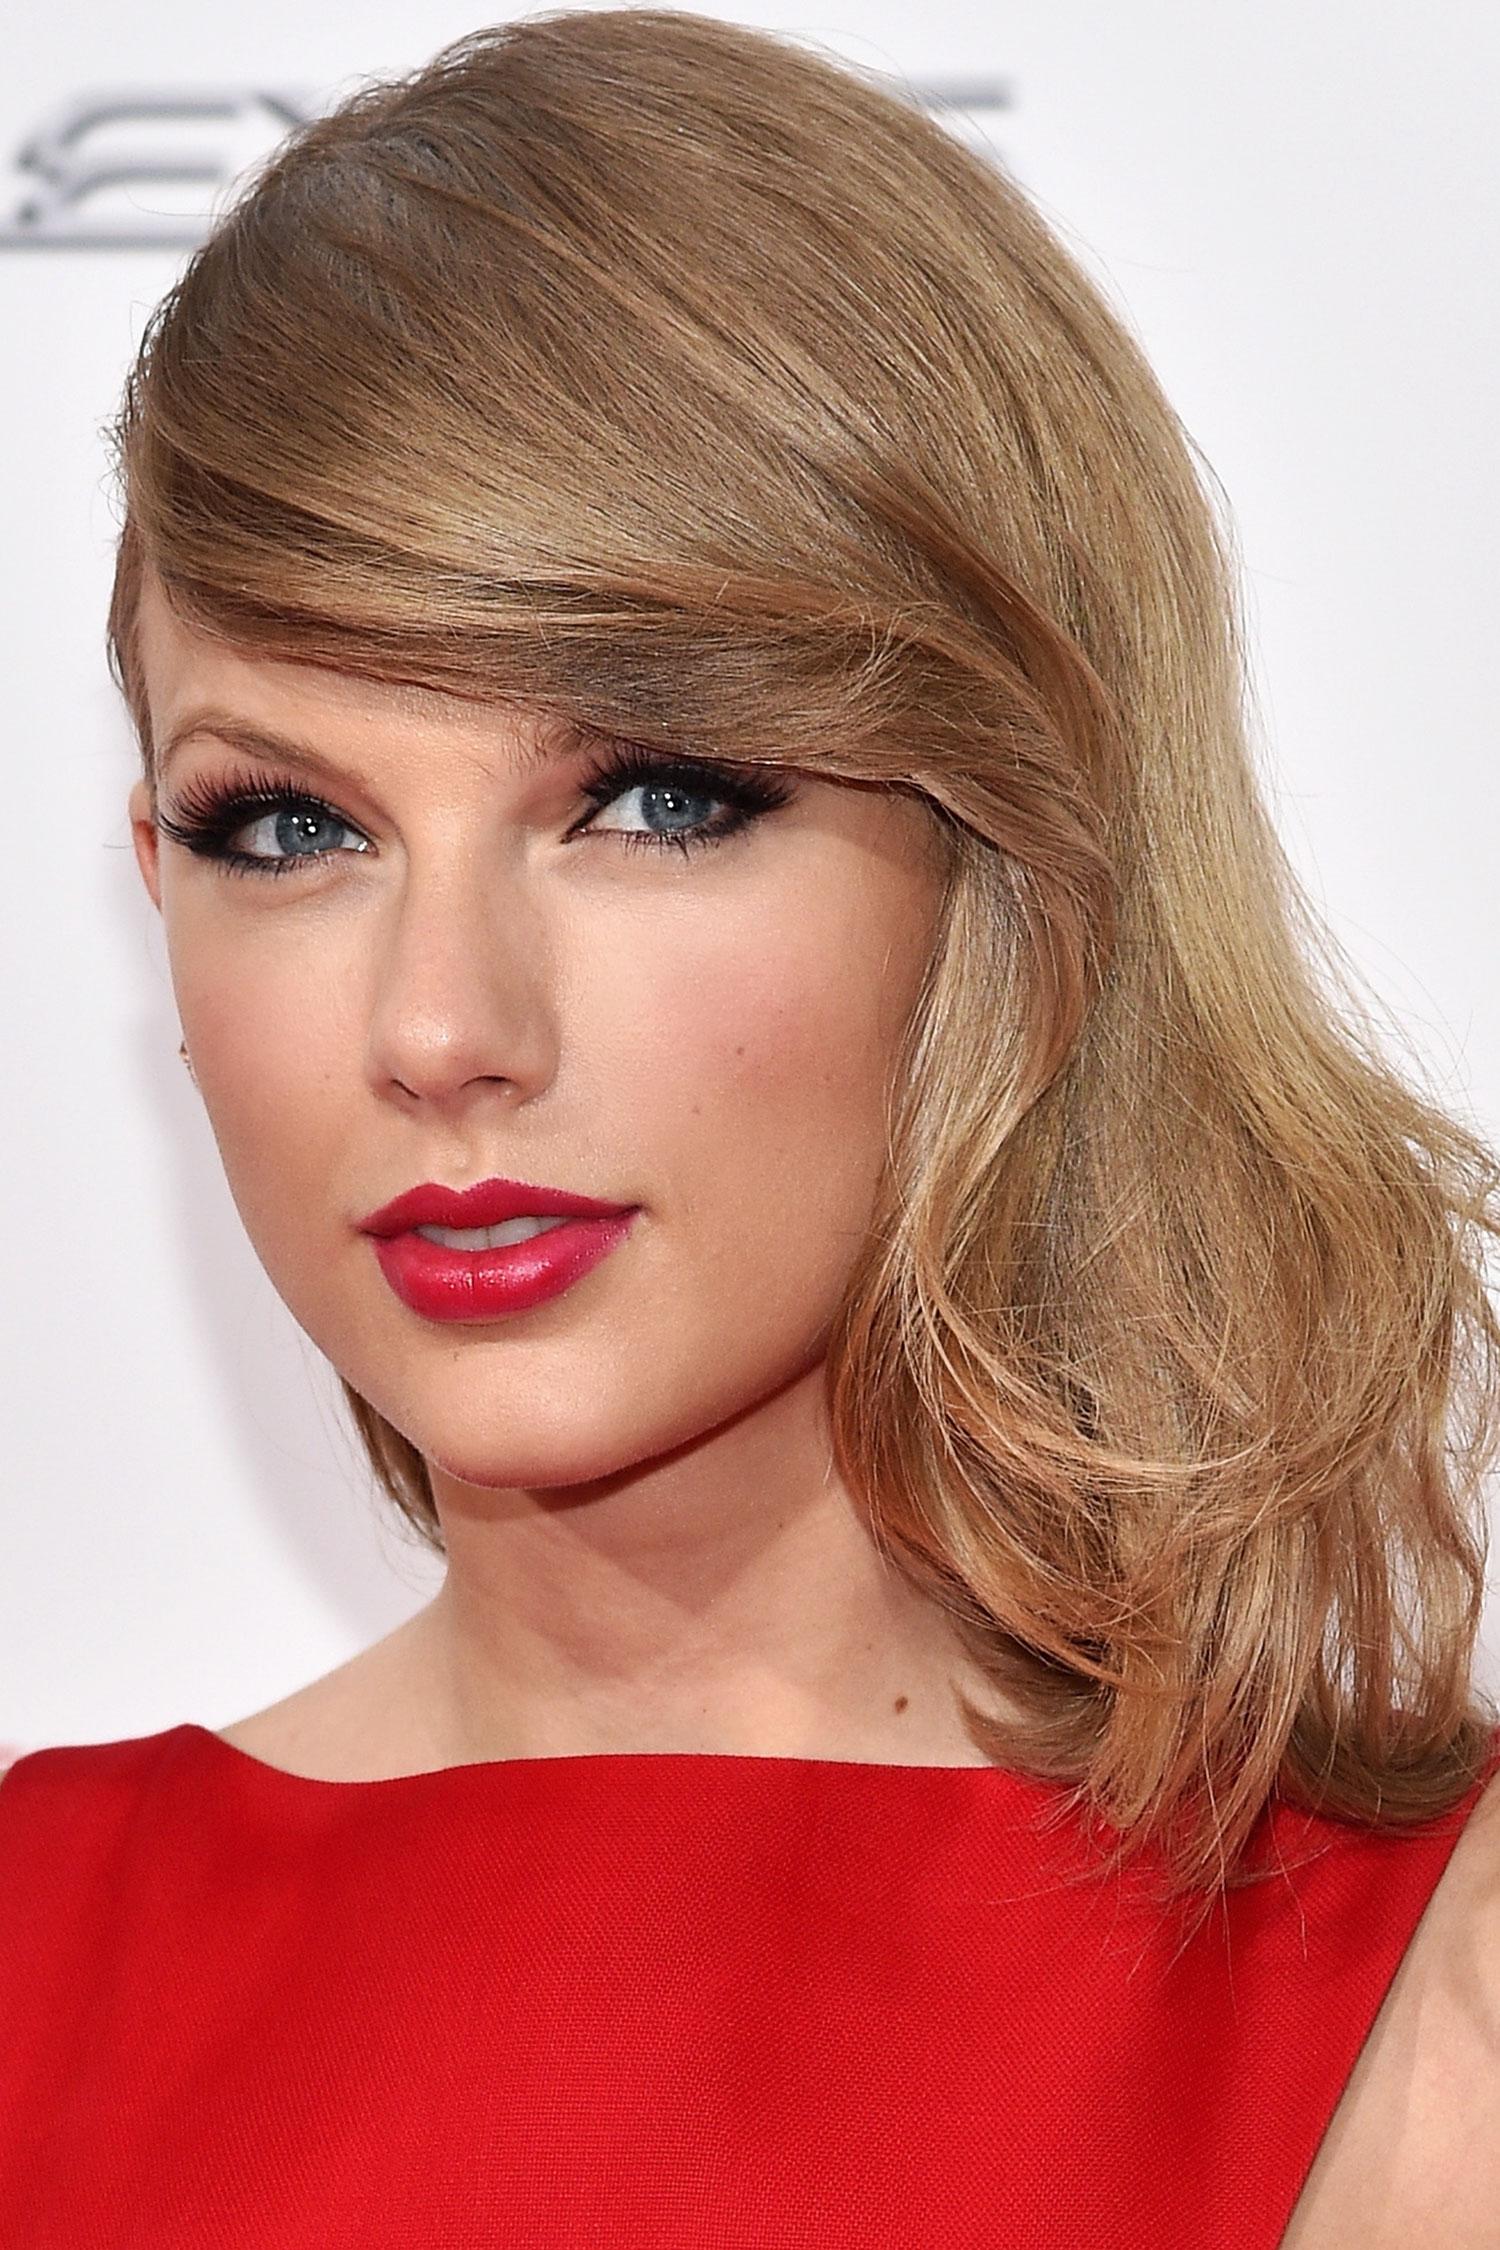 Best Celebrity Blonde Hair - The Best Blonde Hair Colors ...